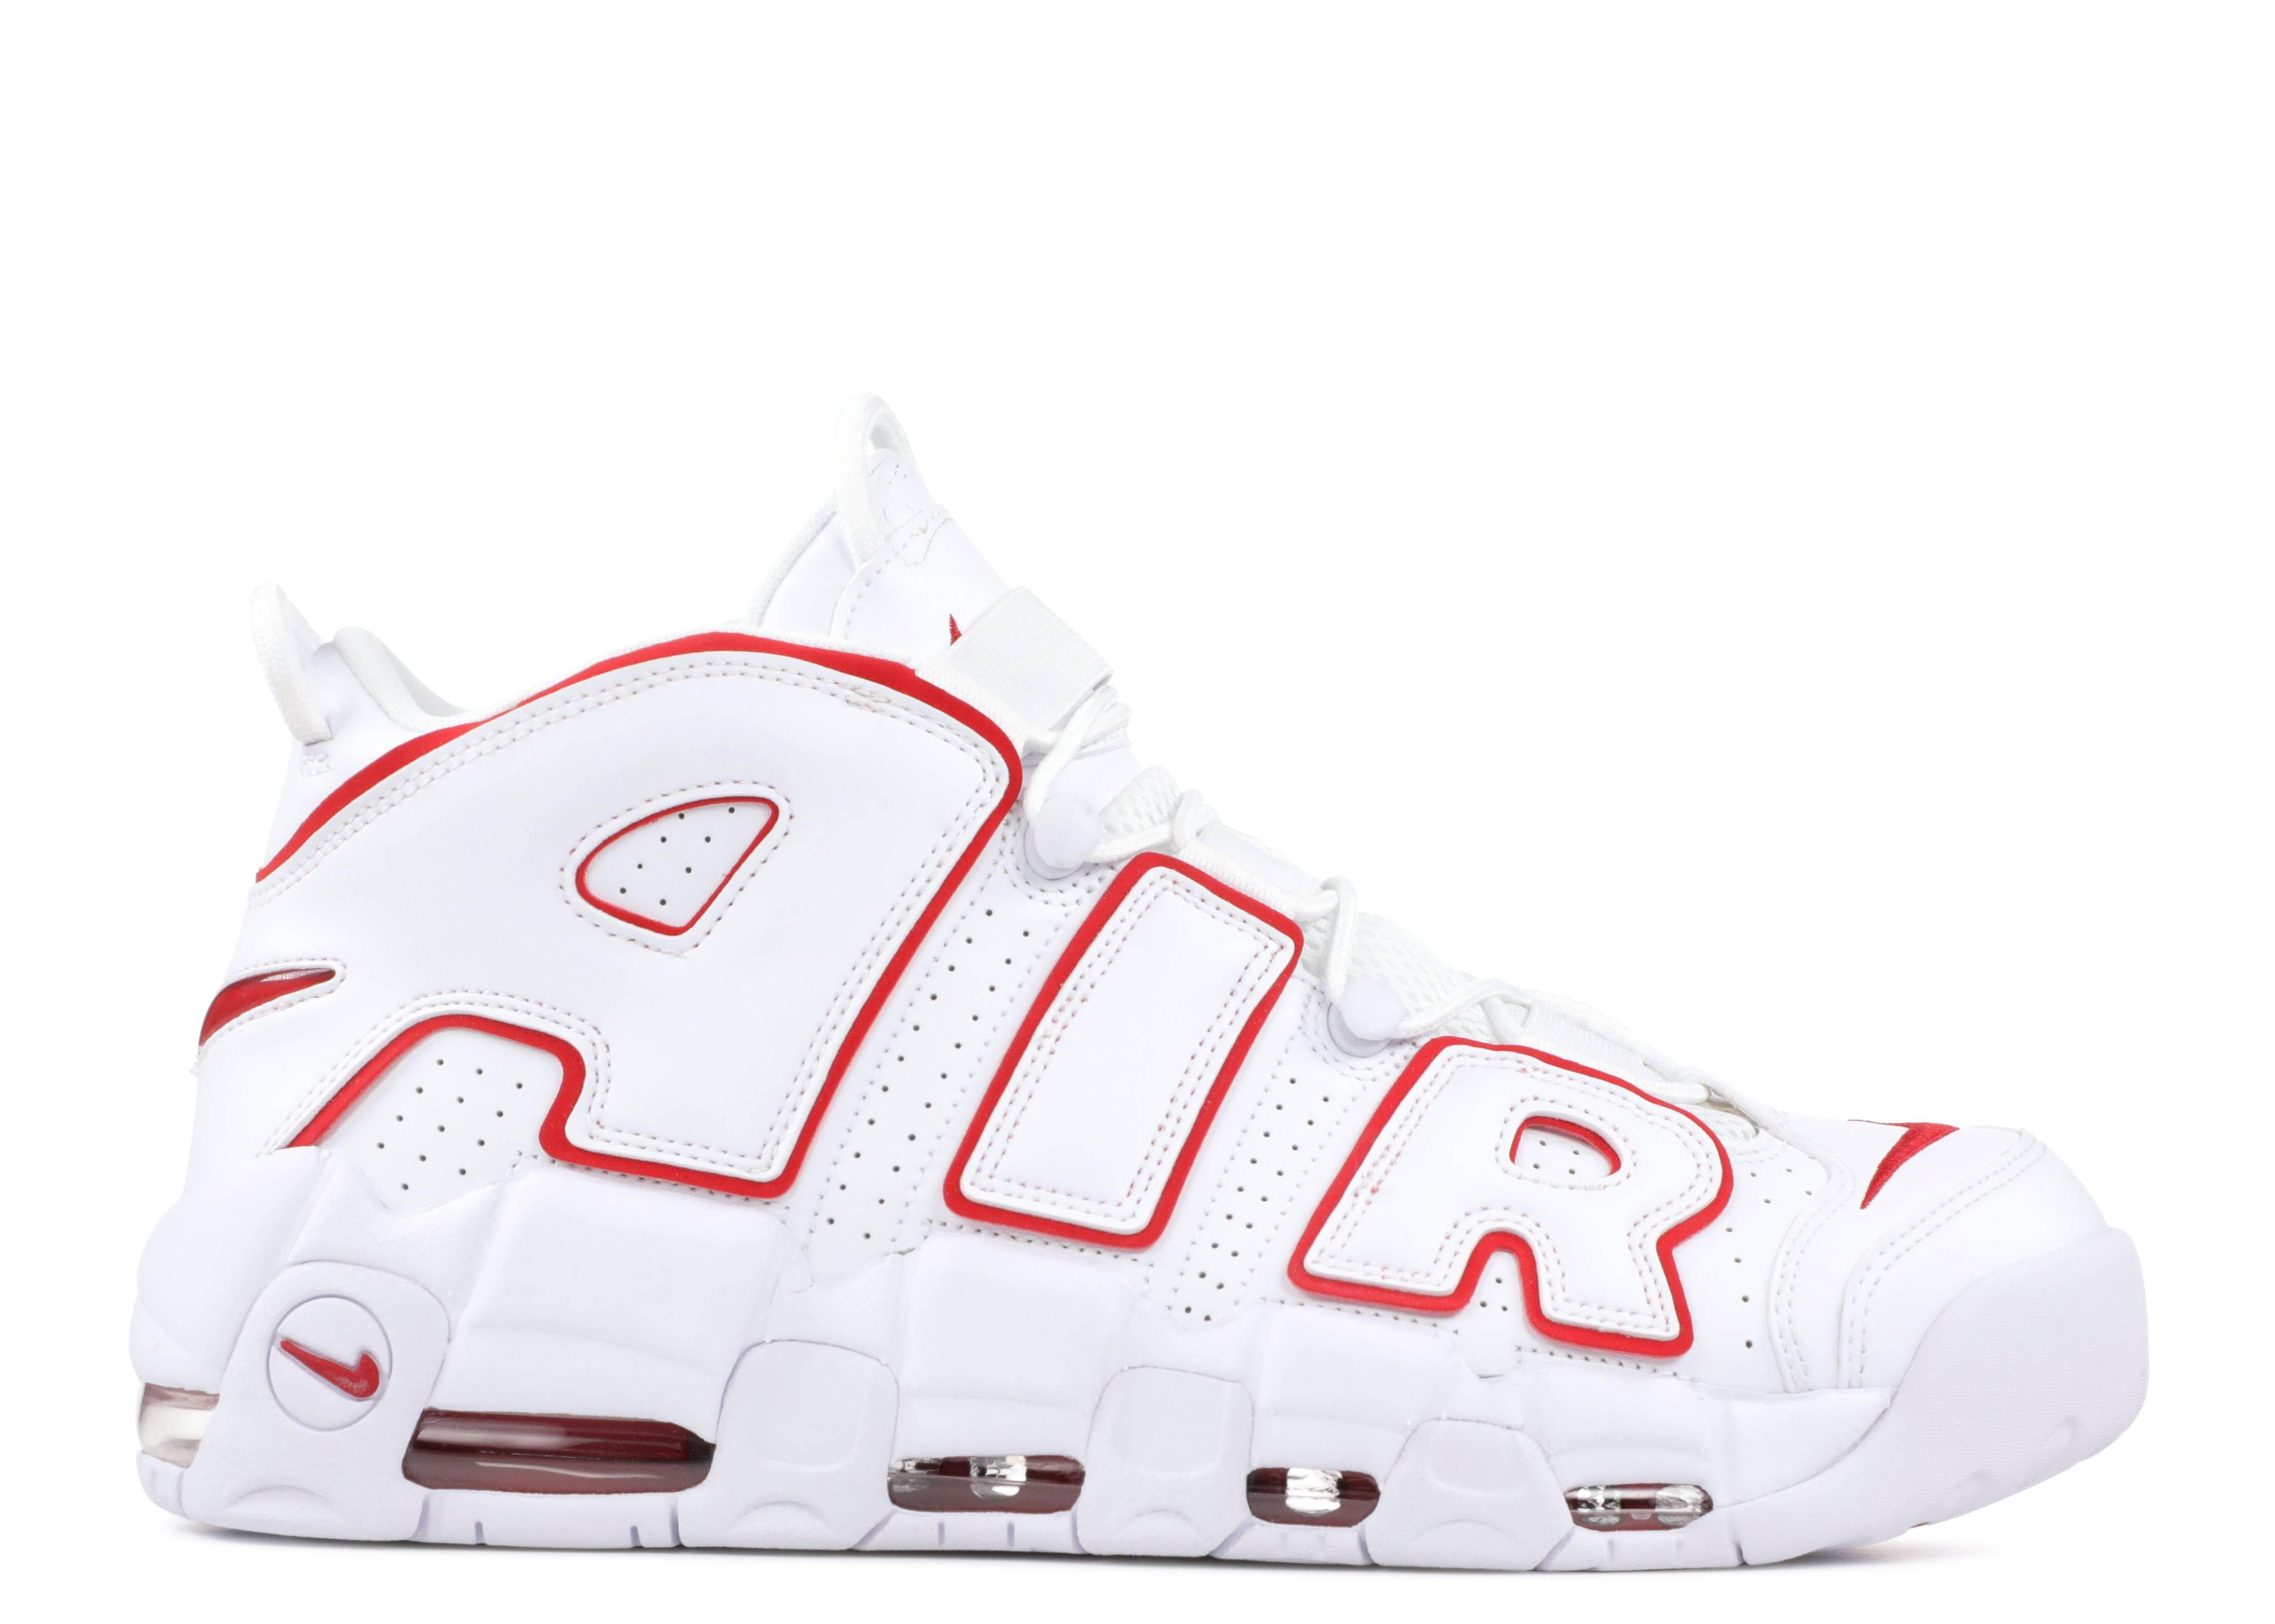 Regresa amplitud Saga  Air More Uptempo 'White Varsity Red' - Nike - 921948 102 - white/varsity red -white | Flight Club